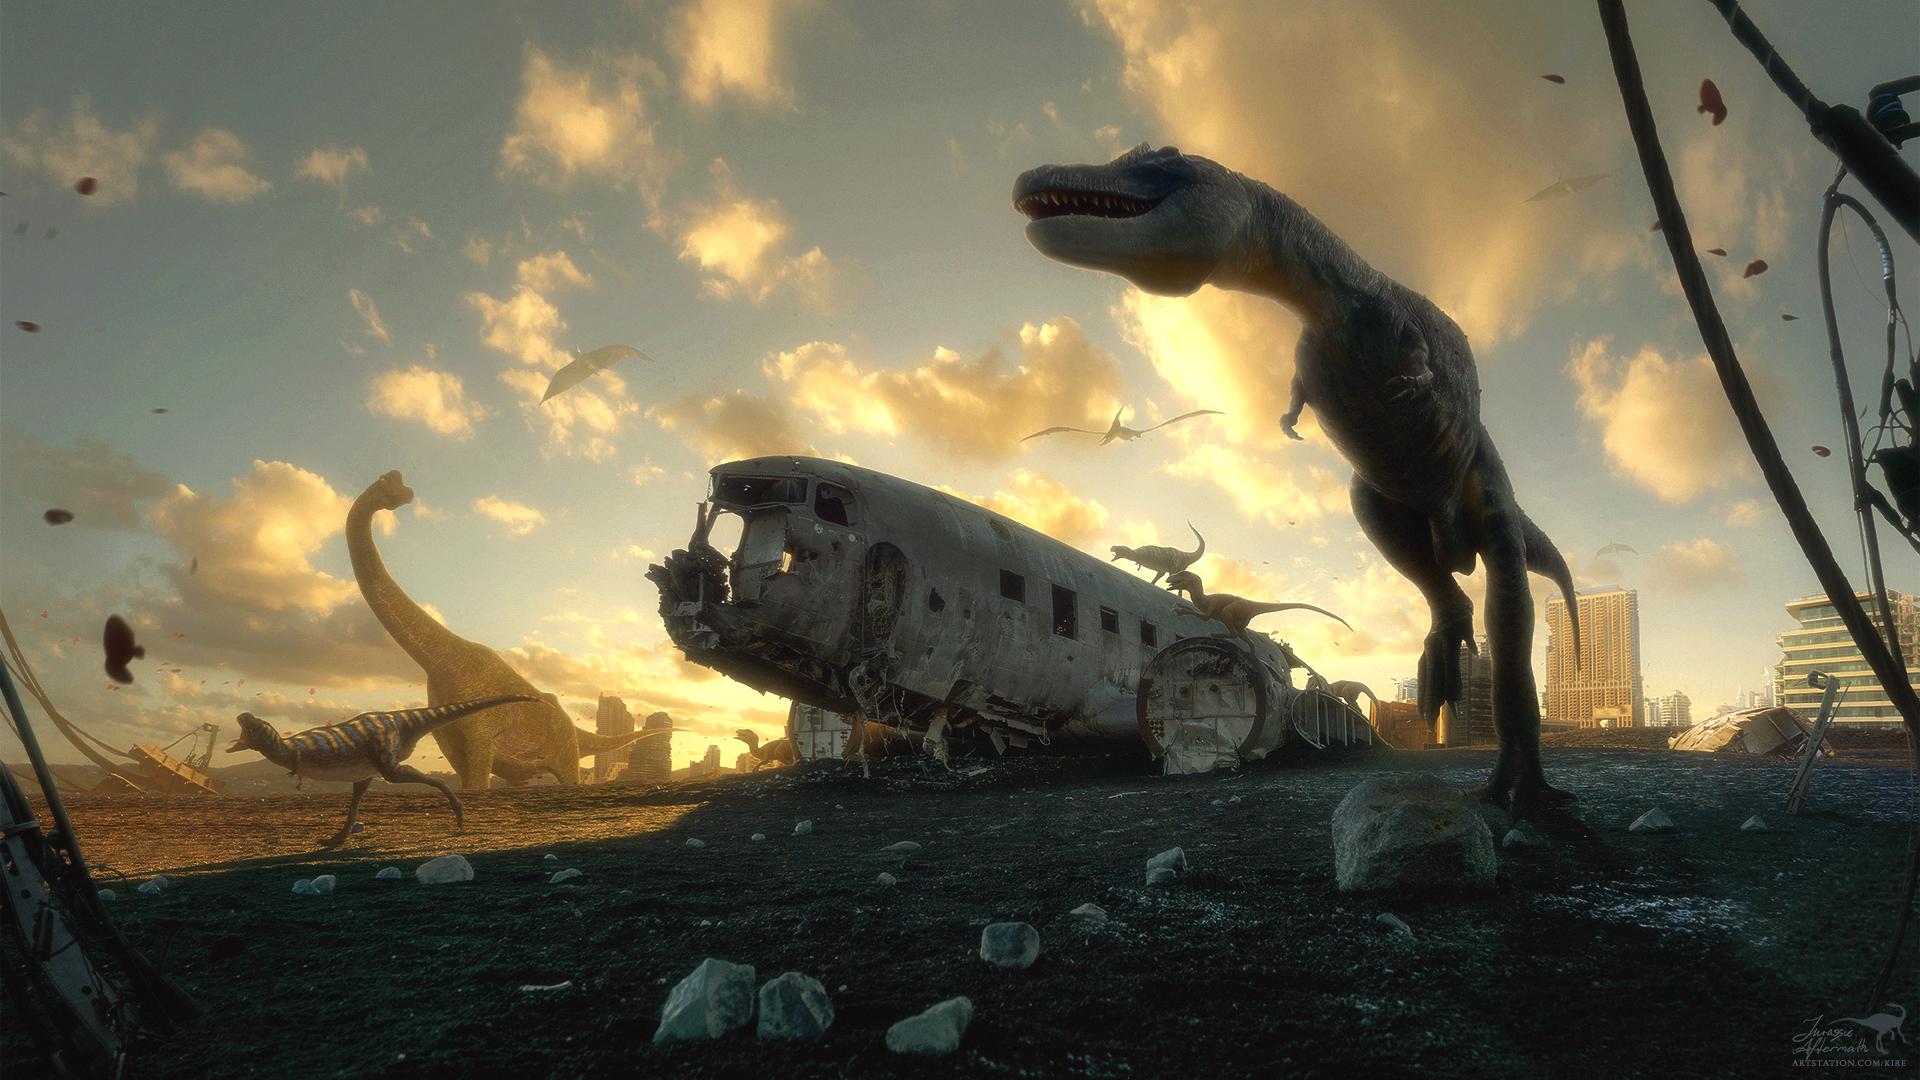 Jurassic Aftermath by ErikShoemaker